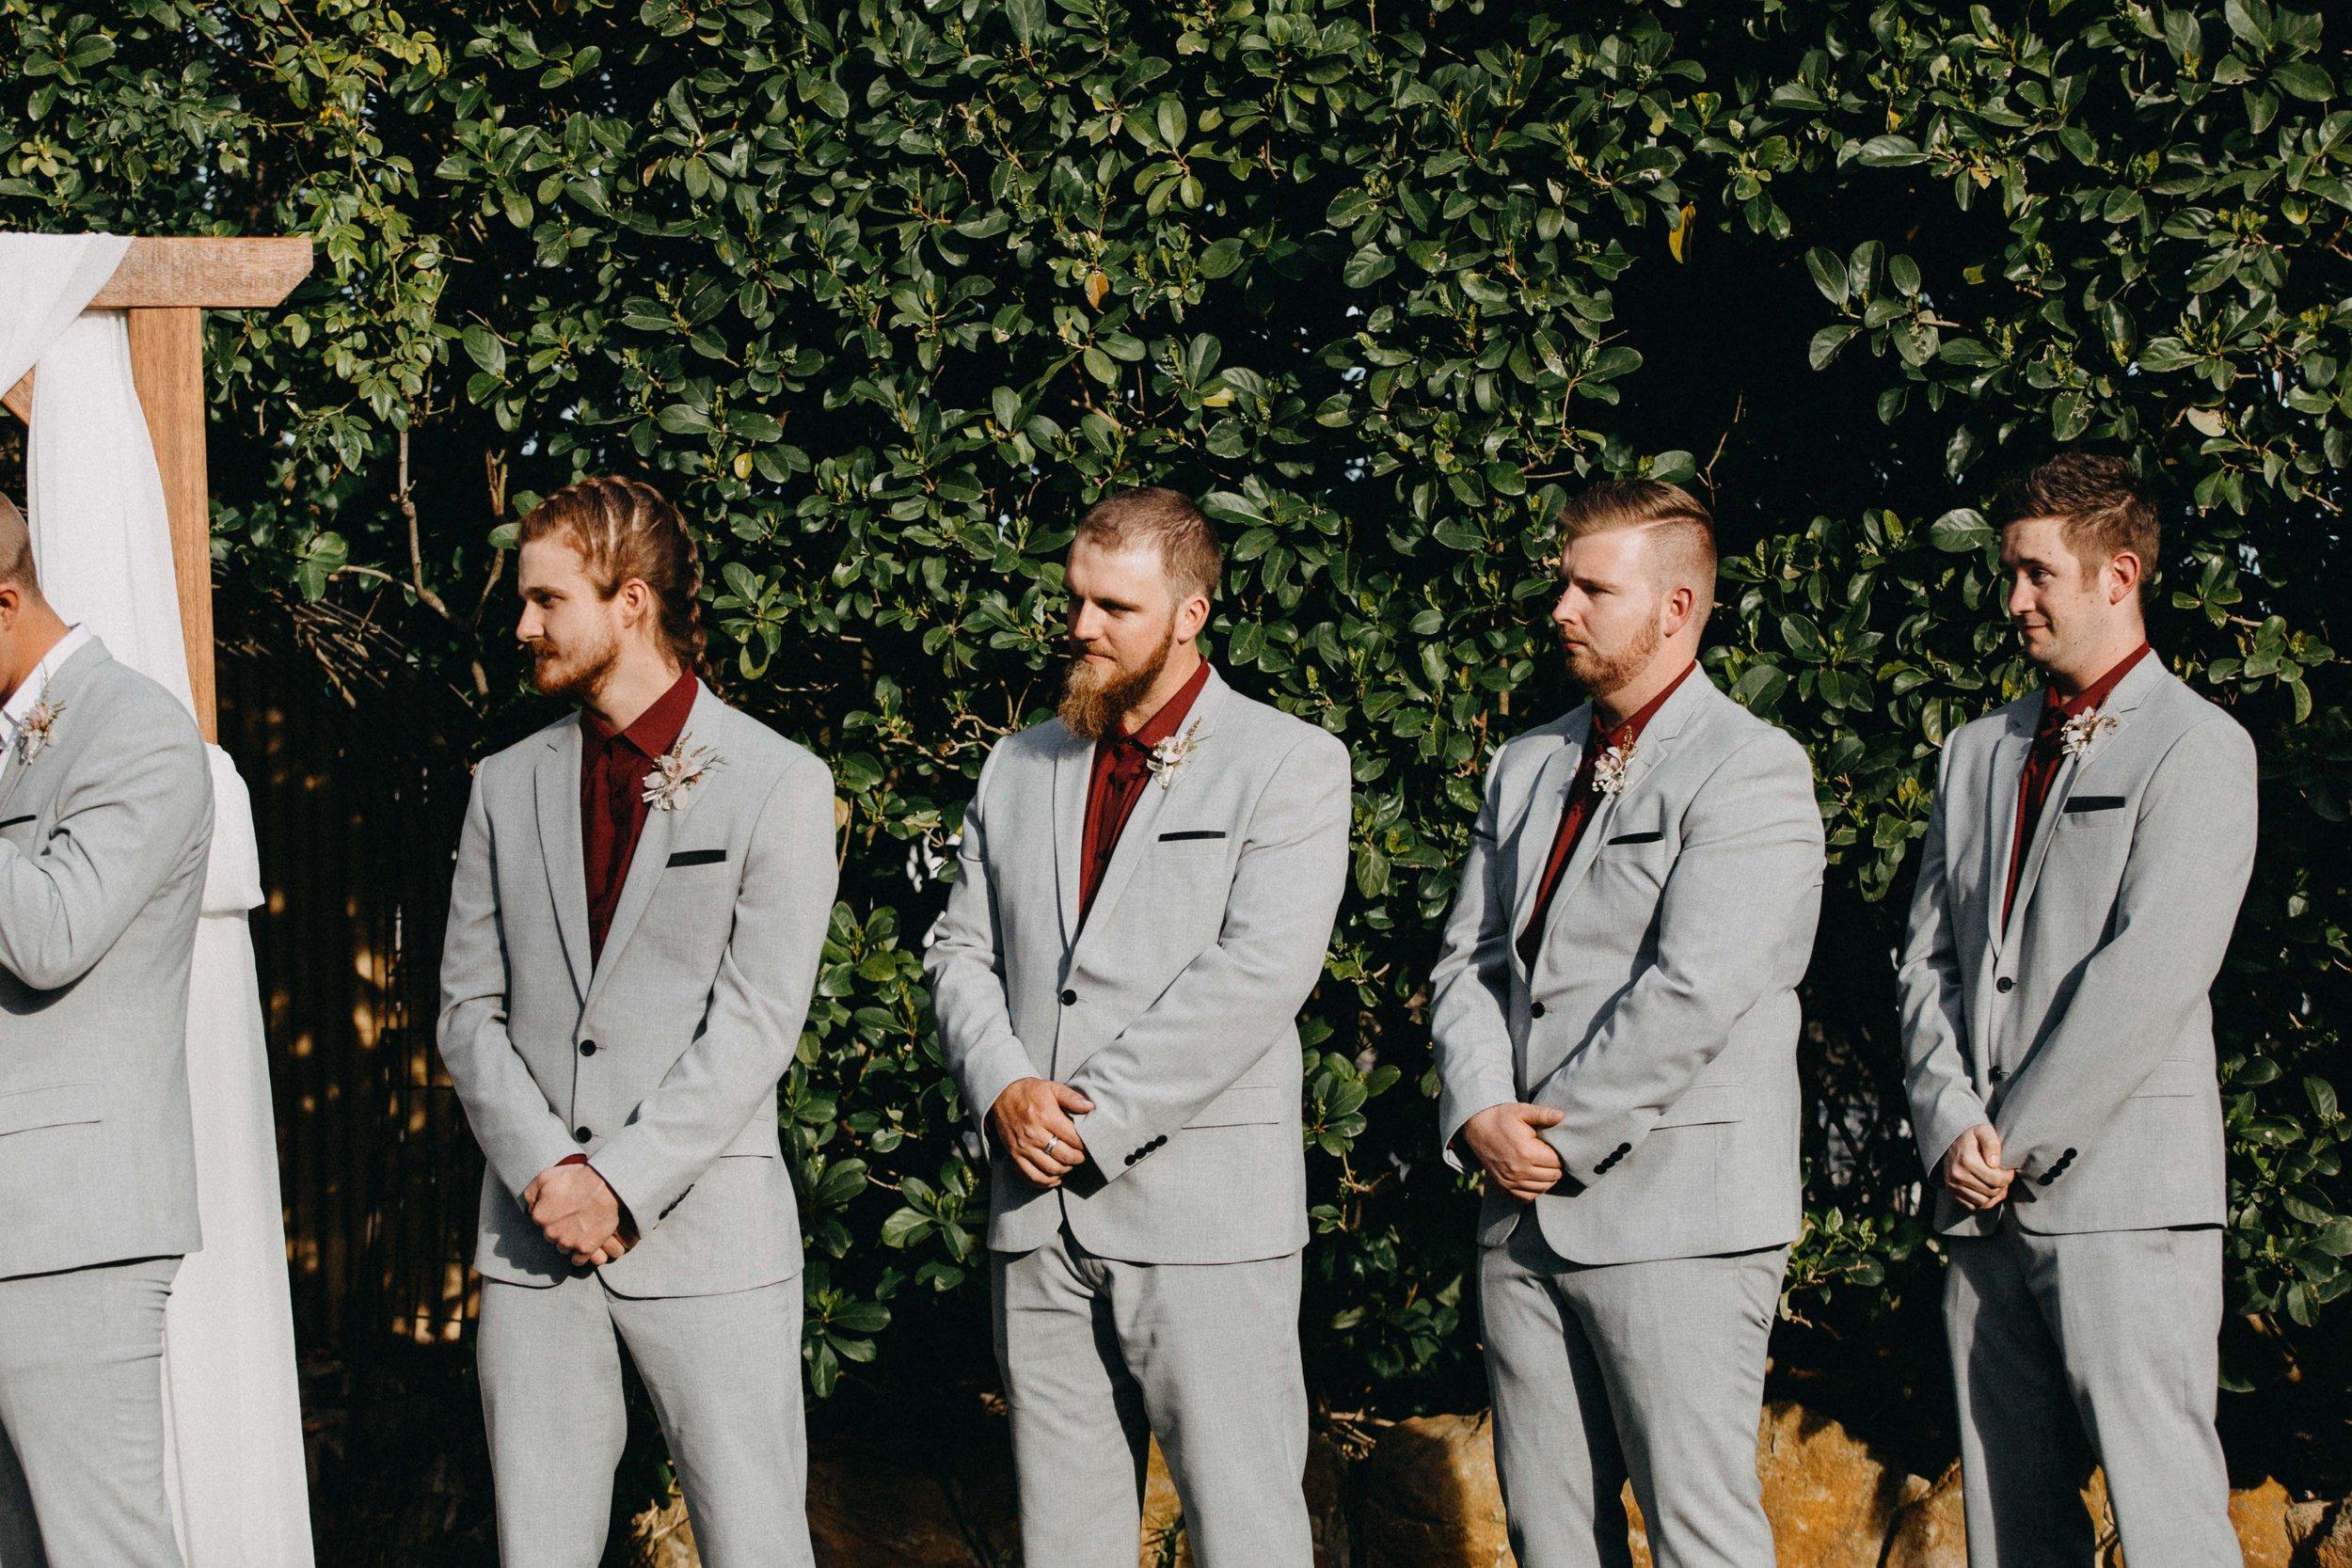 burnham-grove-camden-wedding-emilyobrienphotography-macarthur-66.jpg